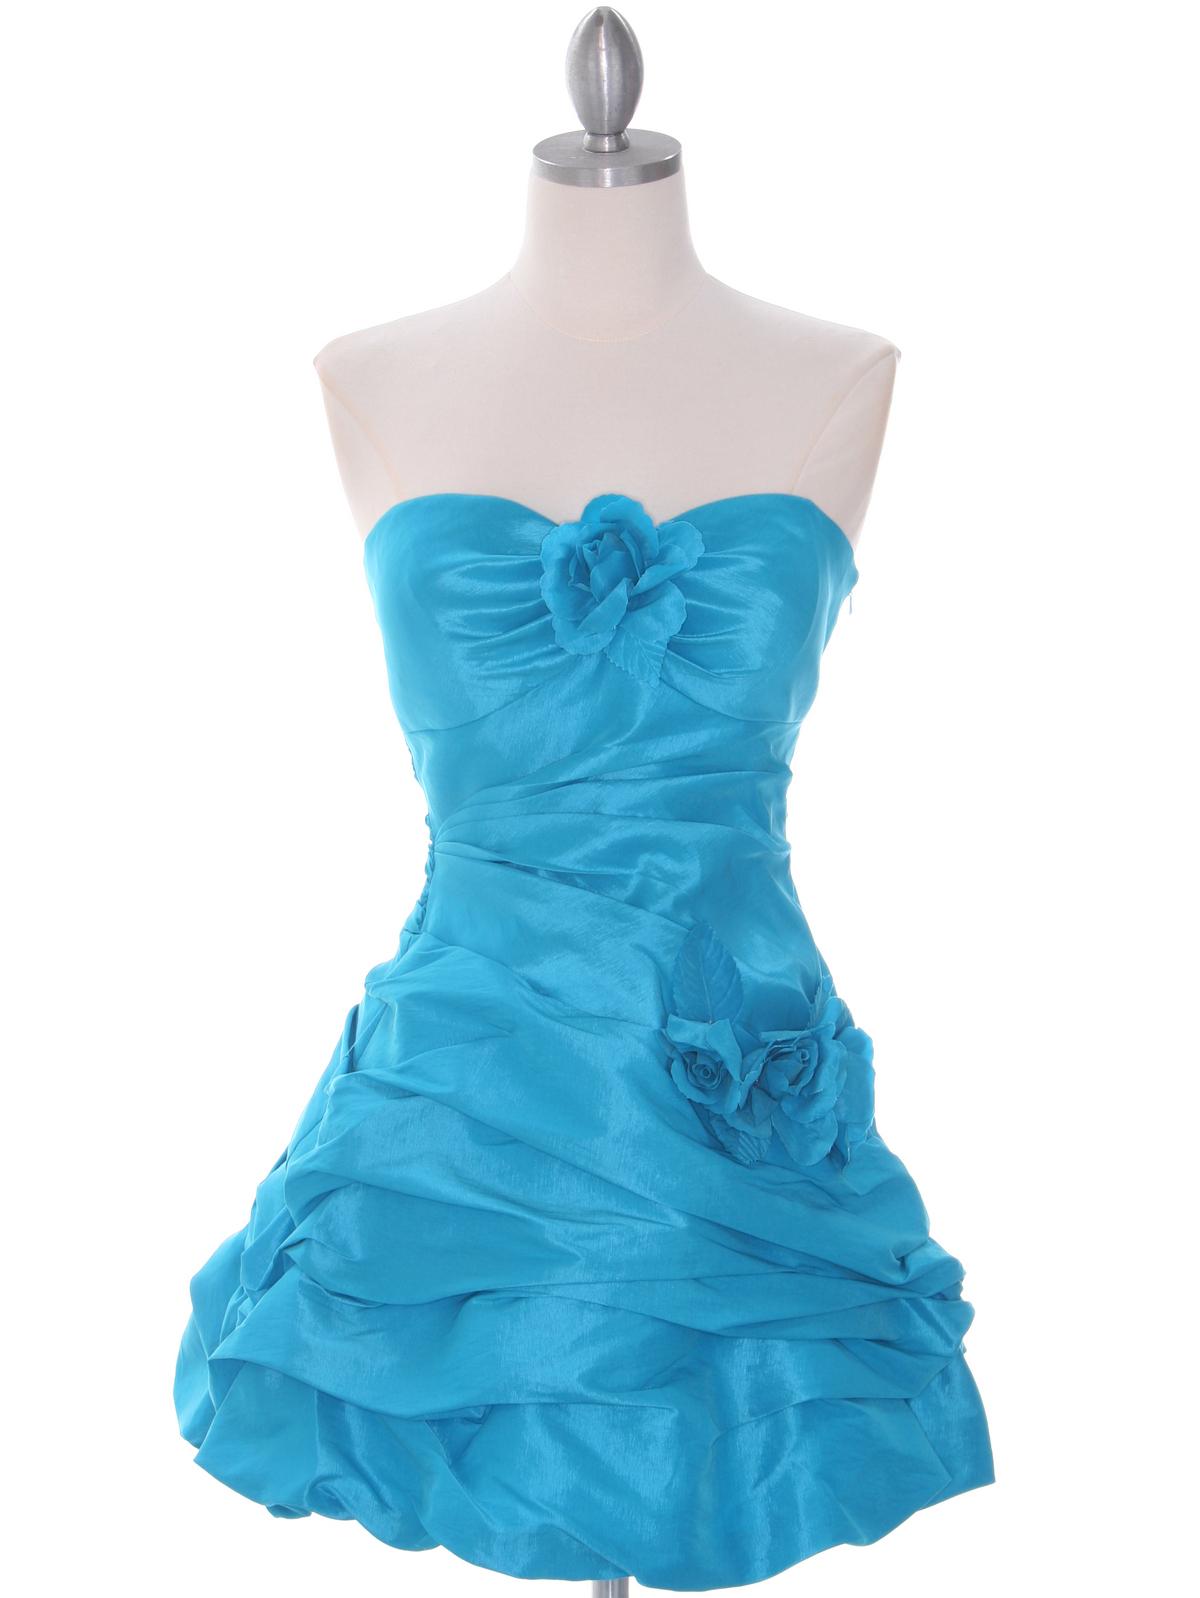 Prom Dresses Downtown LA_Other dresses_dressesss